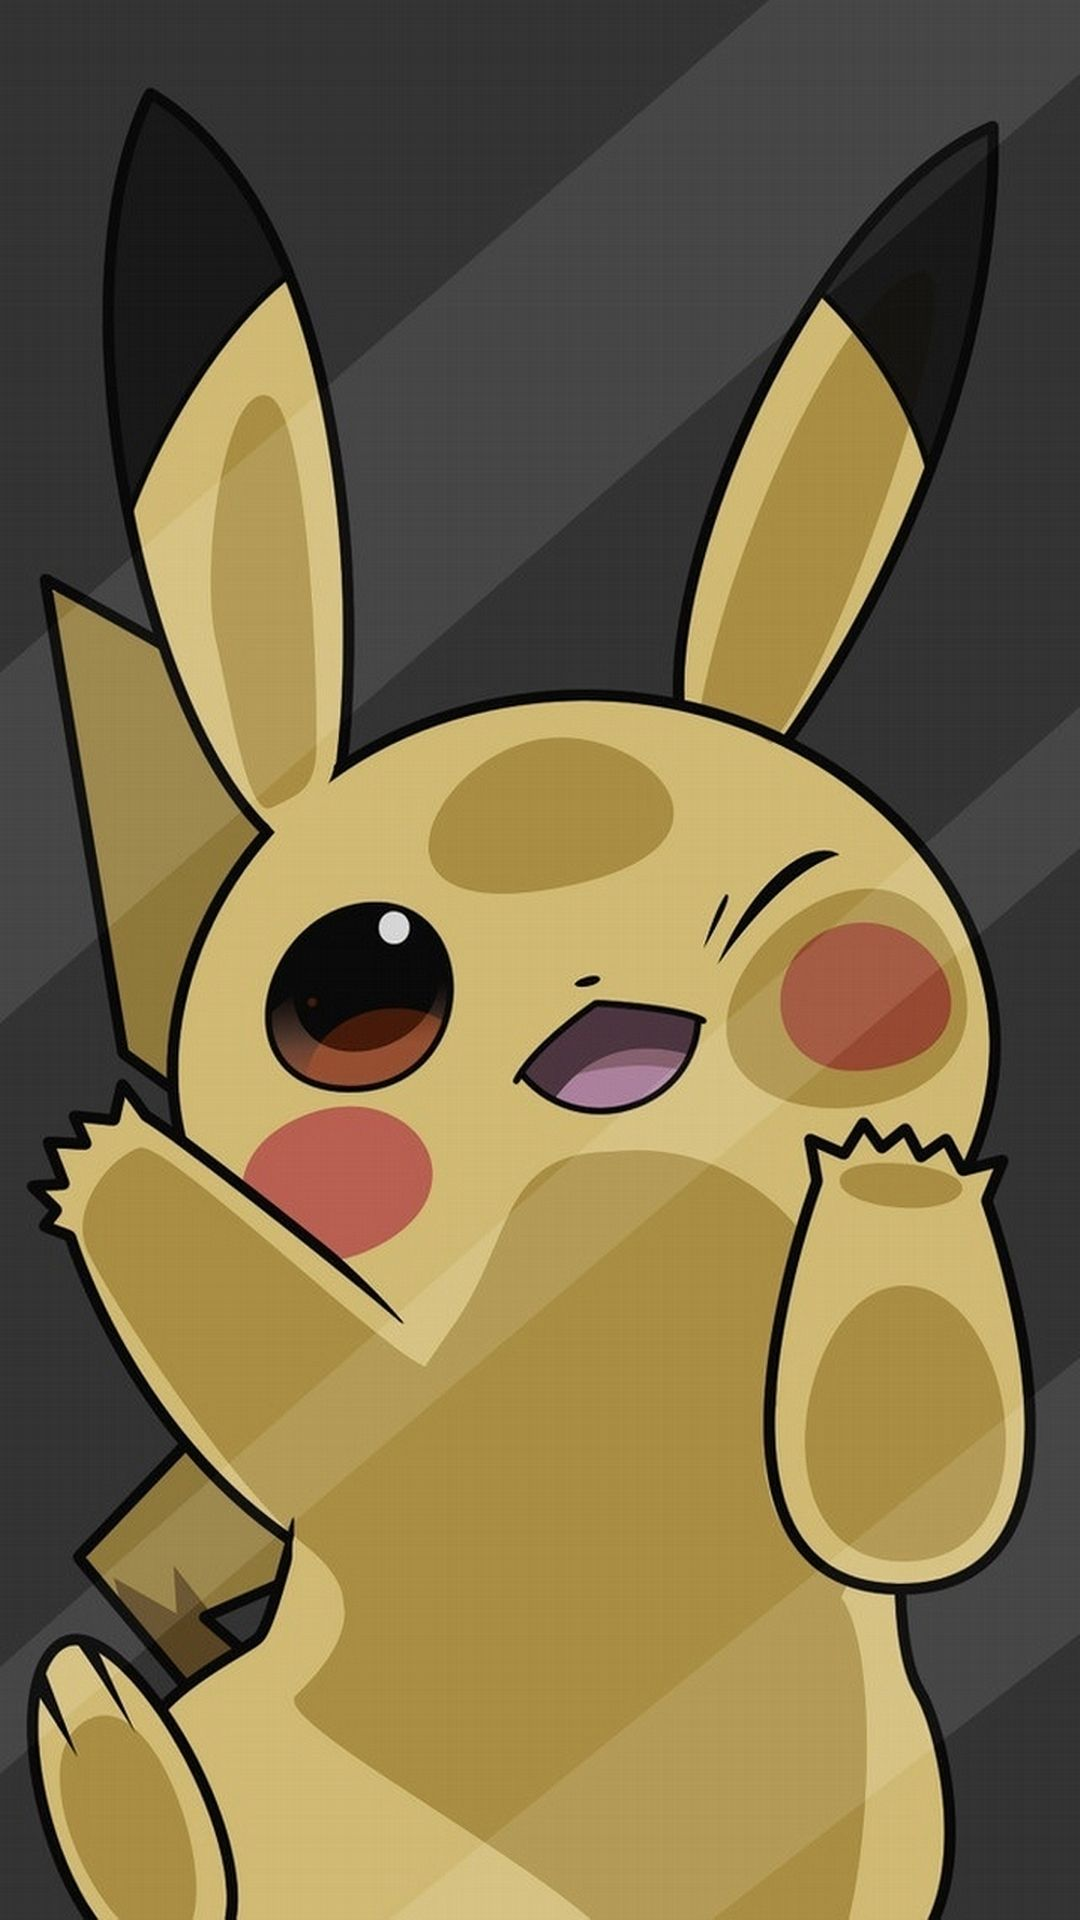 Pokemon iPhone Wallpaper Pikachu, Disney çizimleri